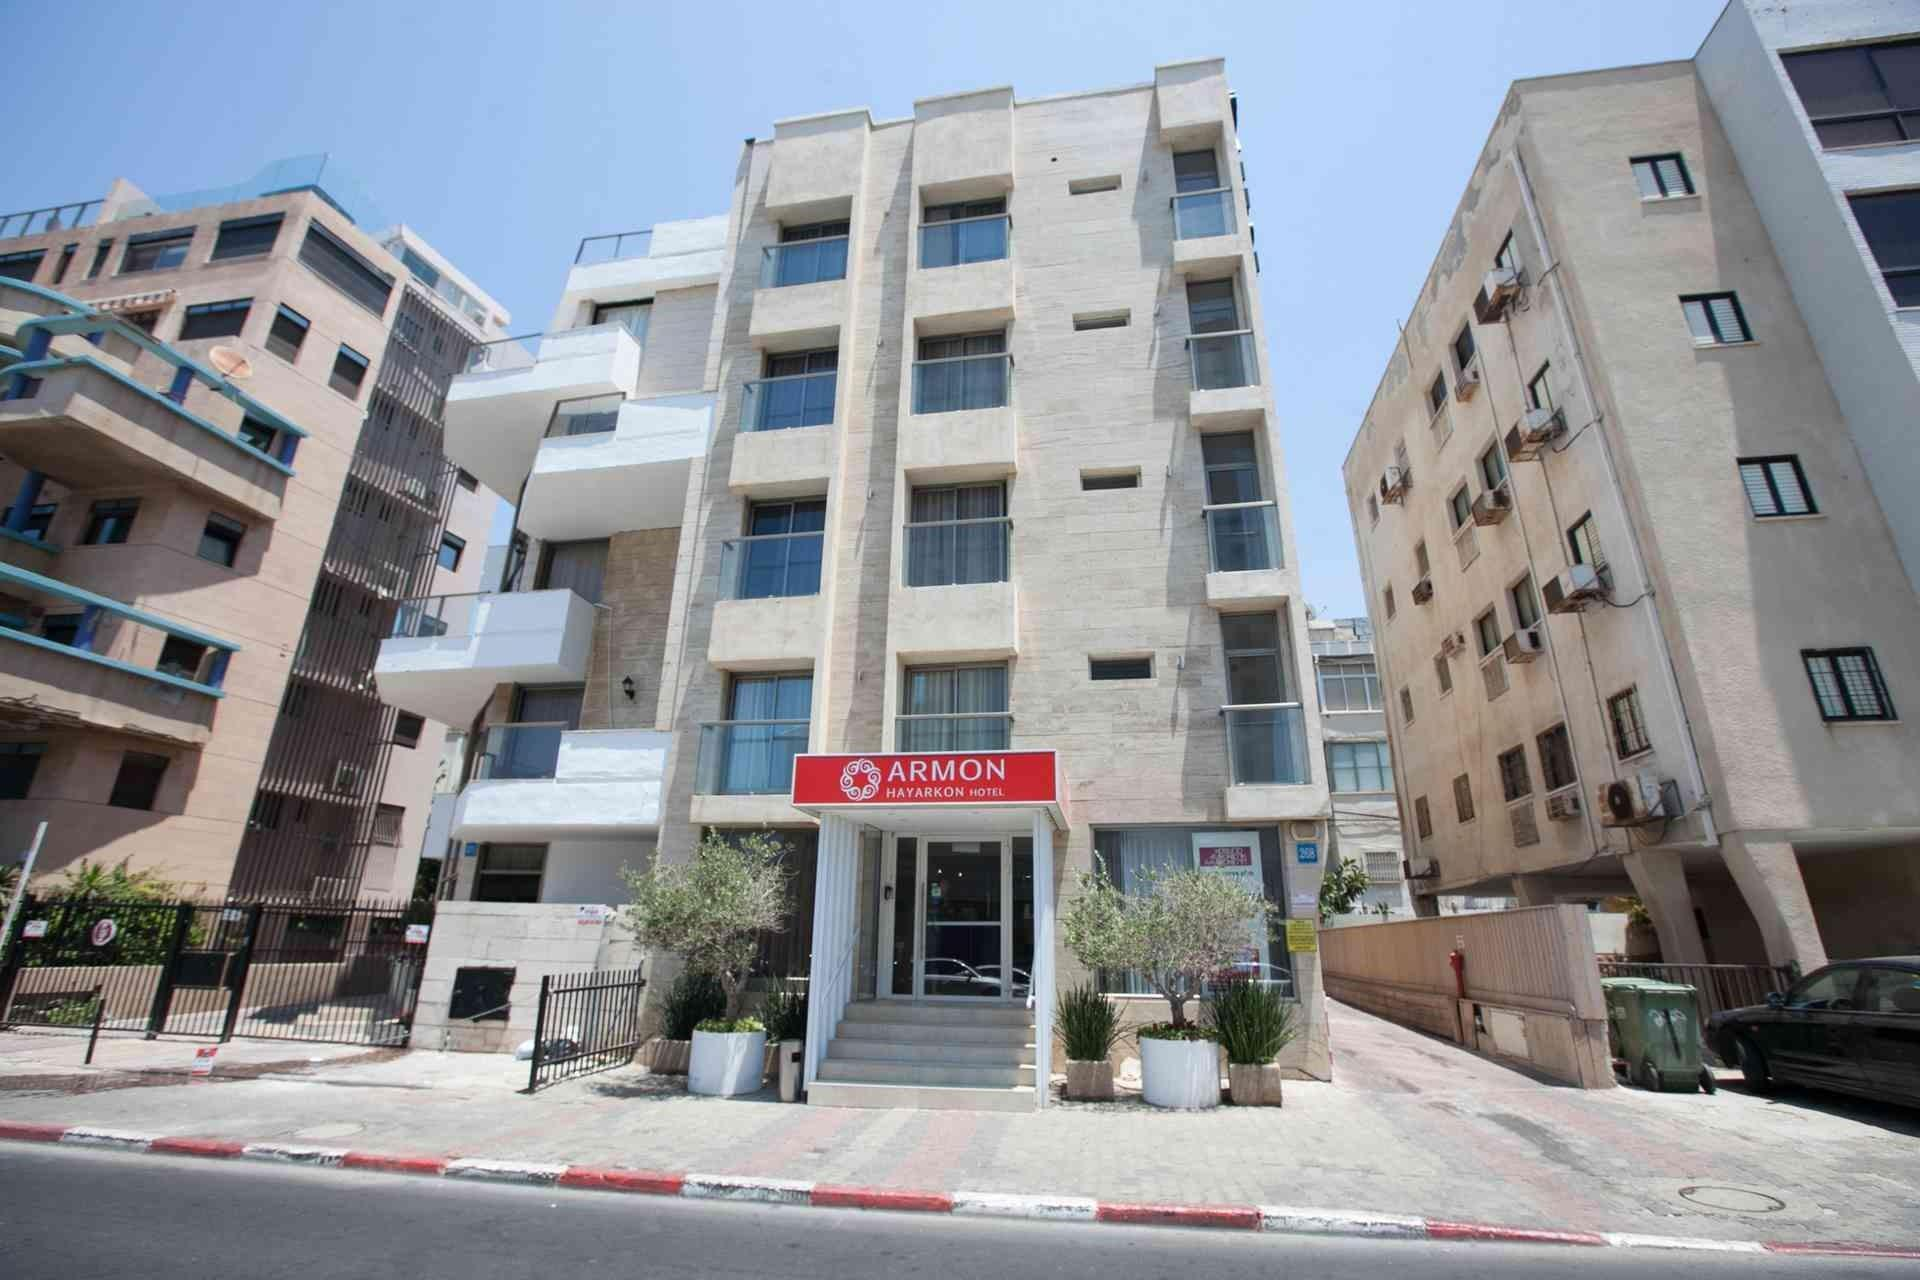 Armon Hayarkon Hotel